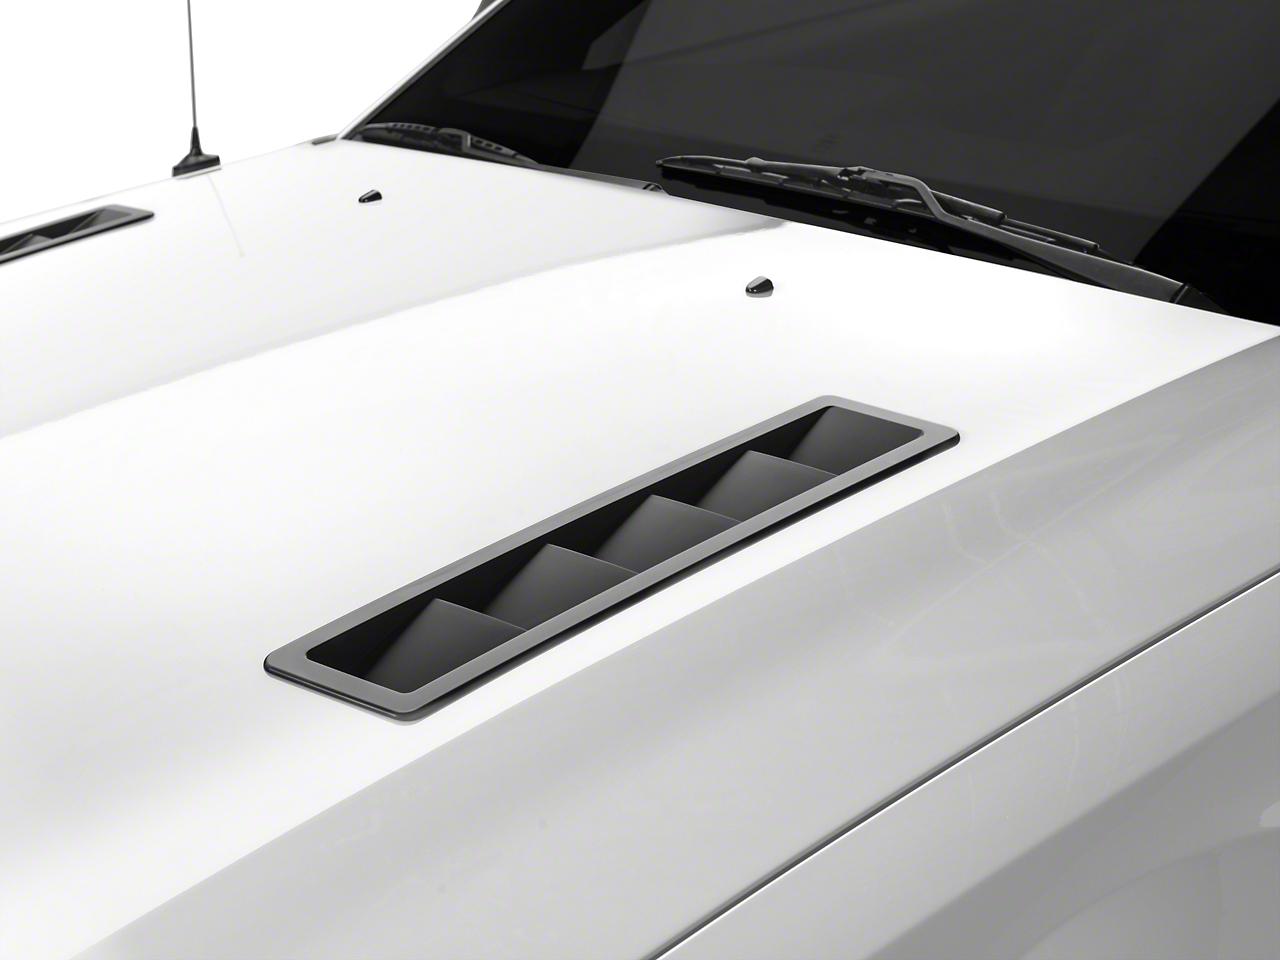 MMD Hood Vent Louvers - Matte Black (05-09 GT, V6)